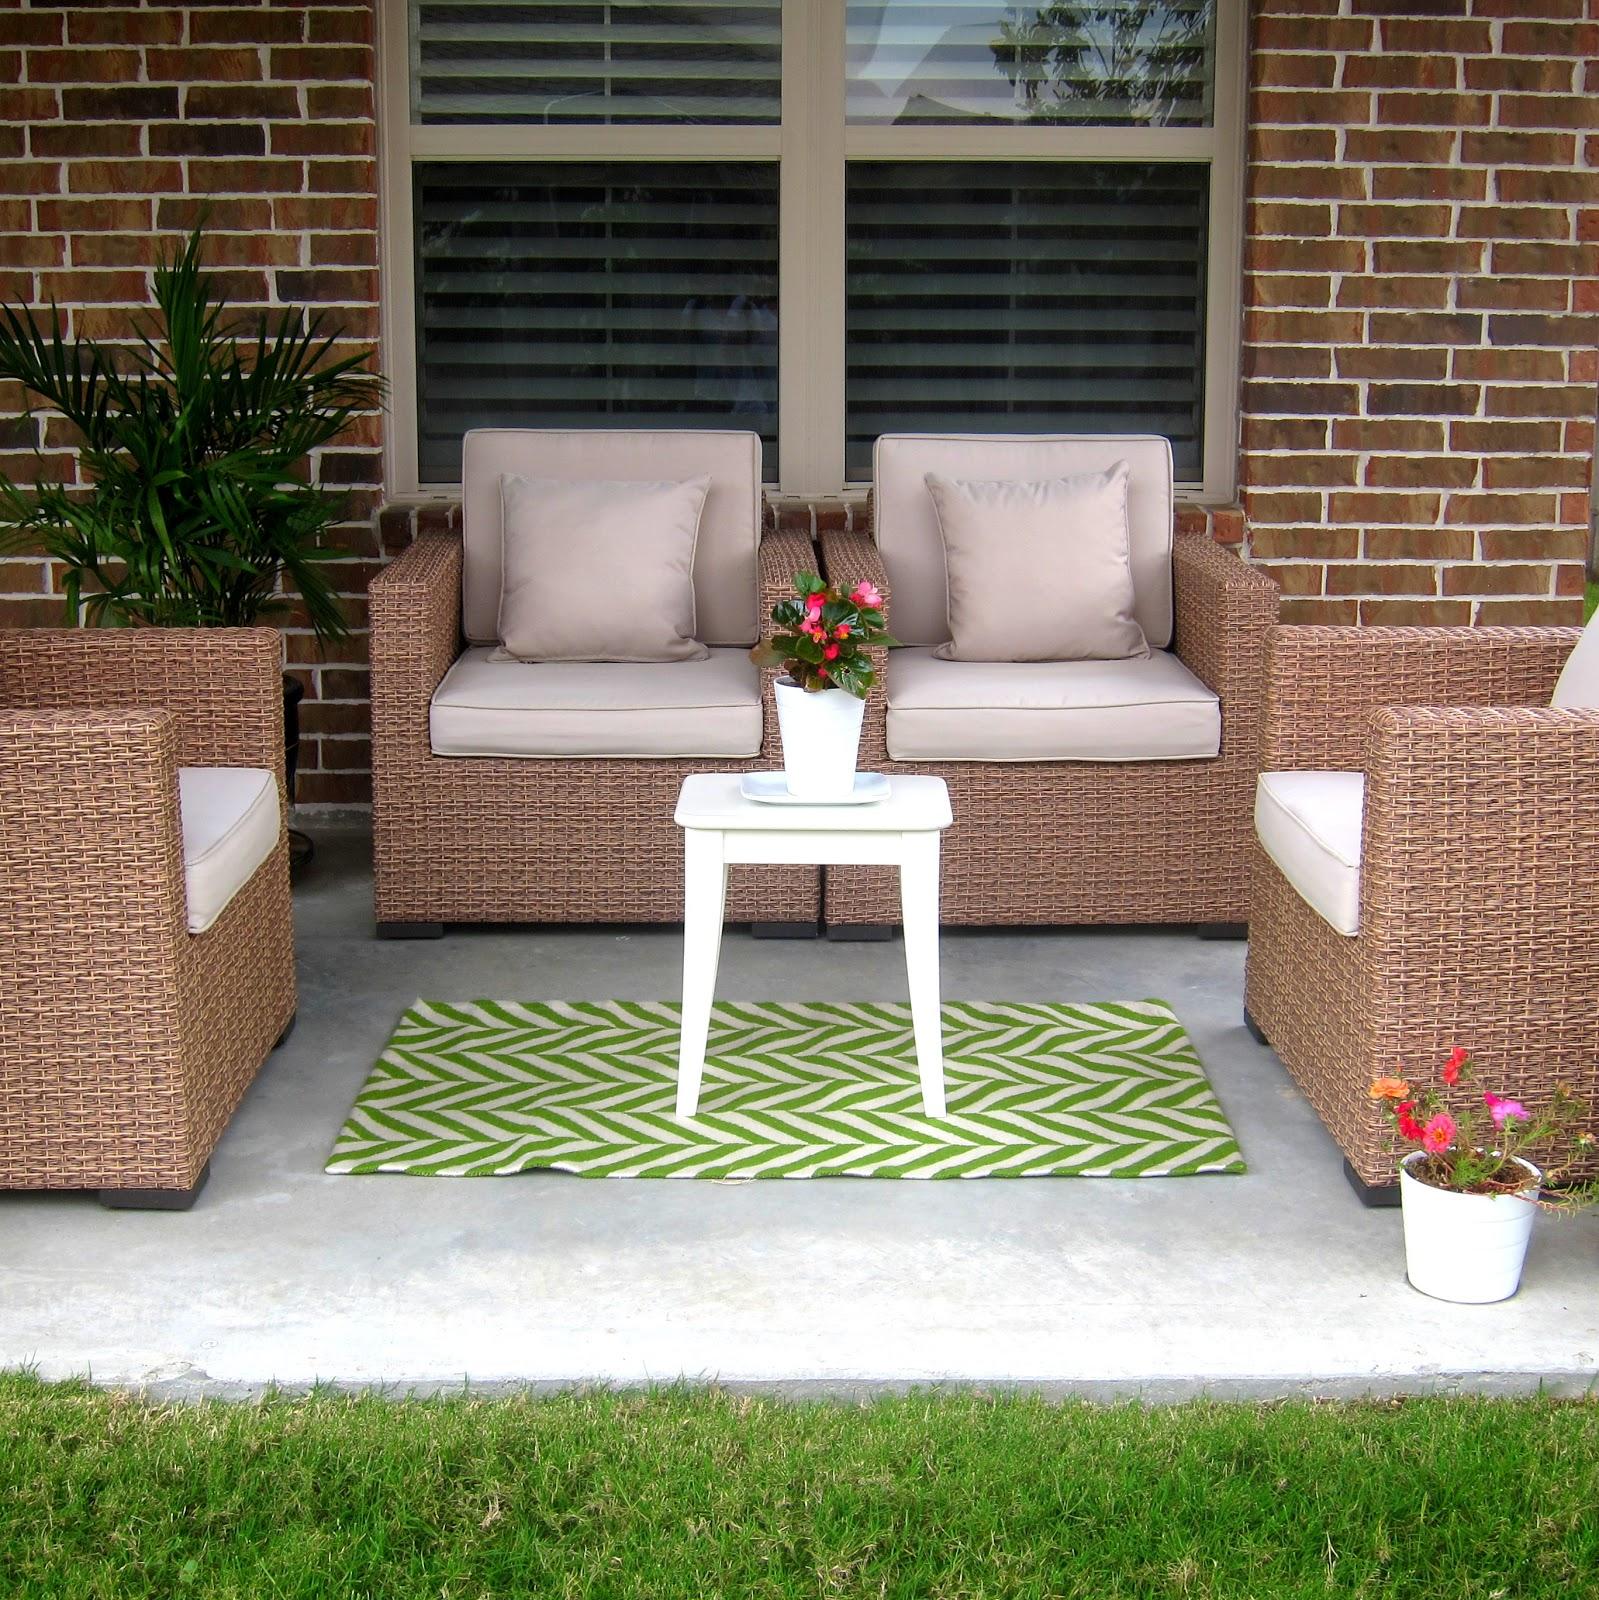 patio rug decor ideas patio rugs elegant wicker patio furniture with cushions and SVWXSLR